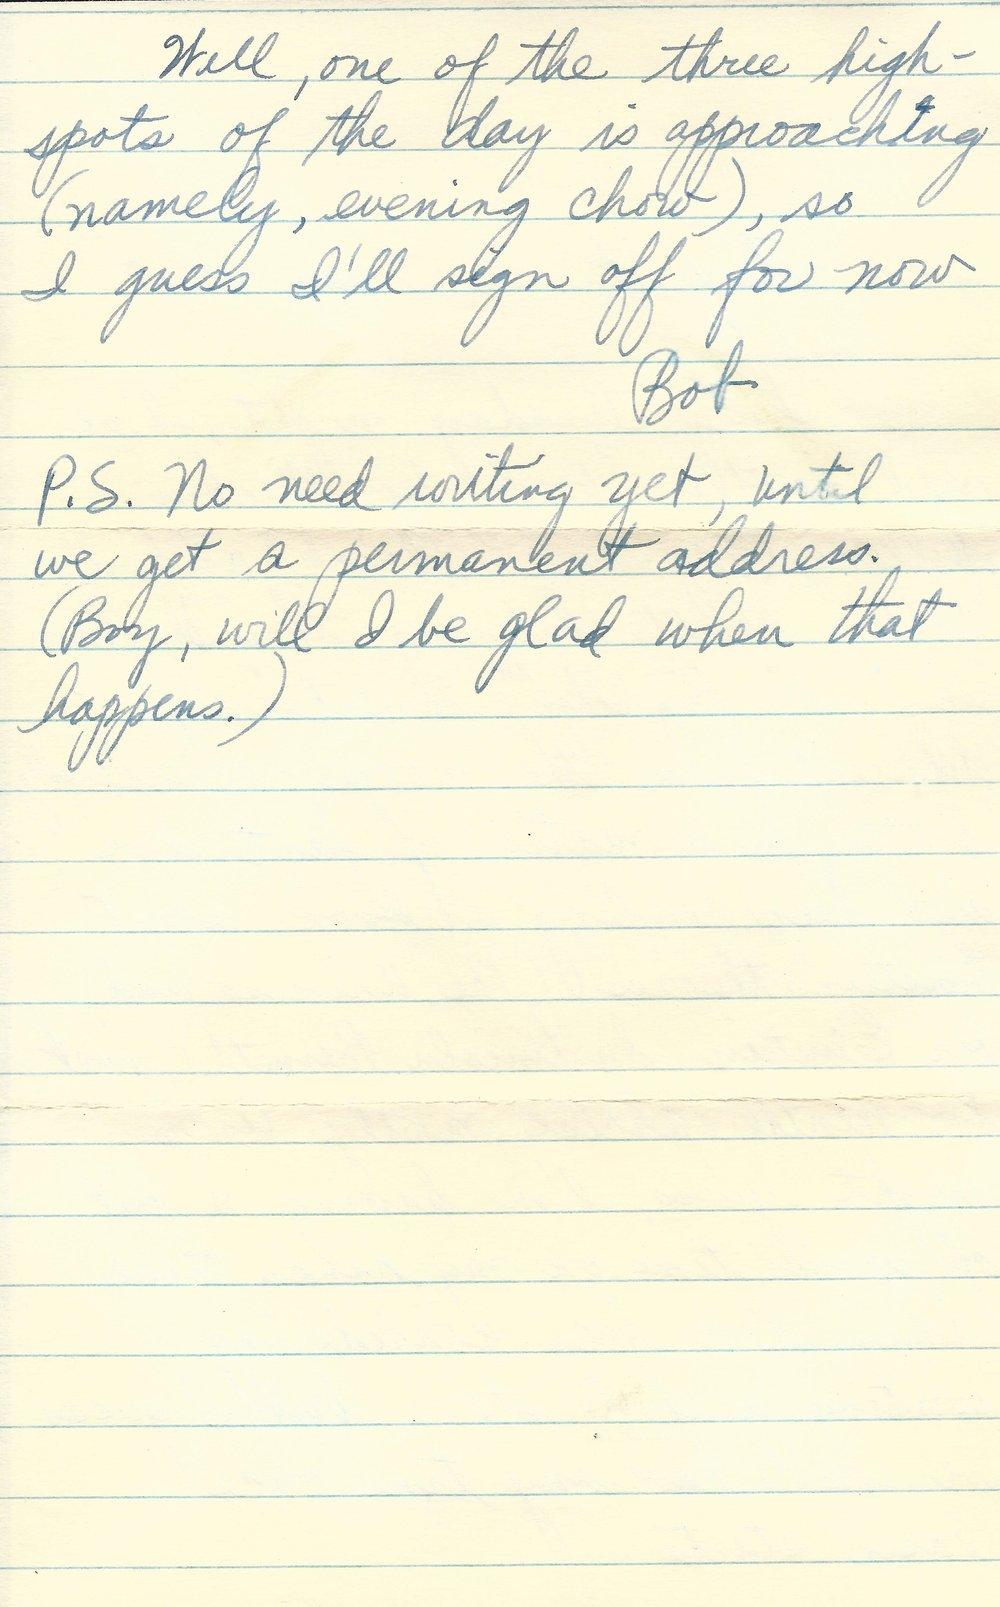 5. Oct. 16, 1952 (Opa)_Page_5.jpg